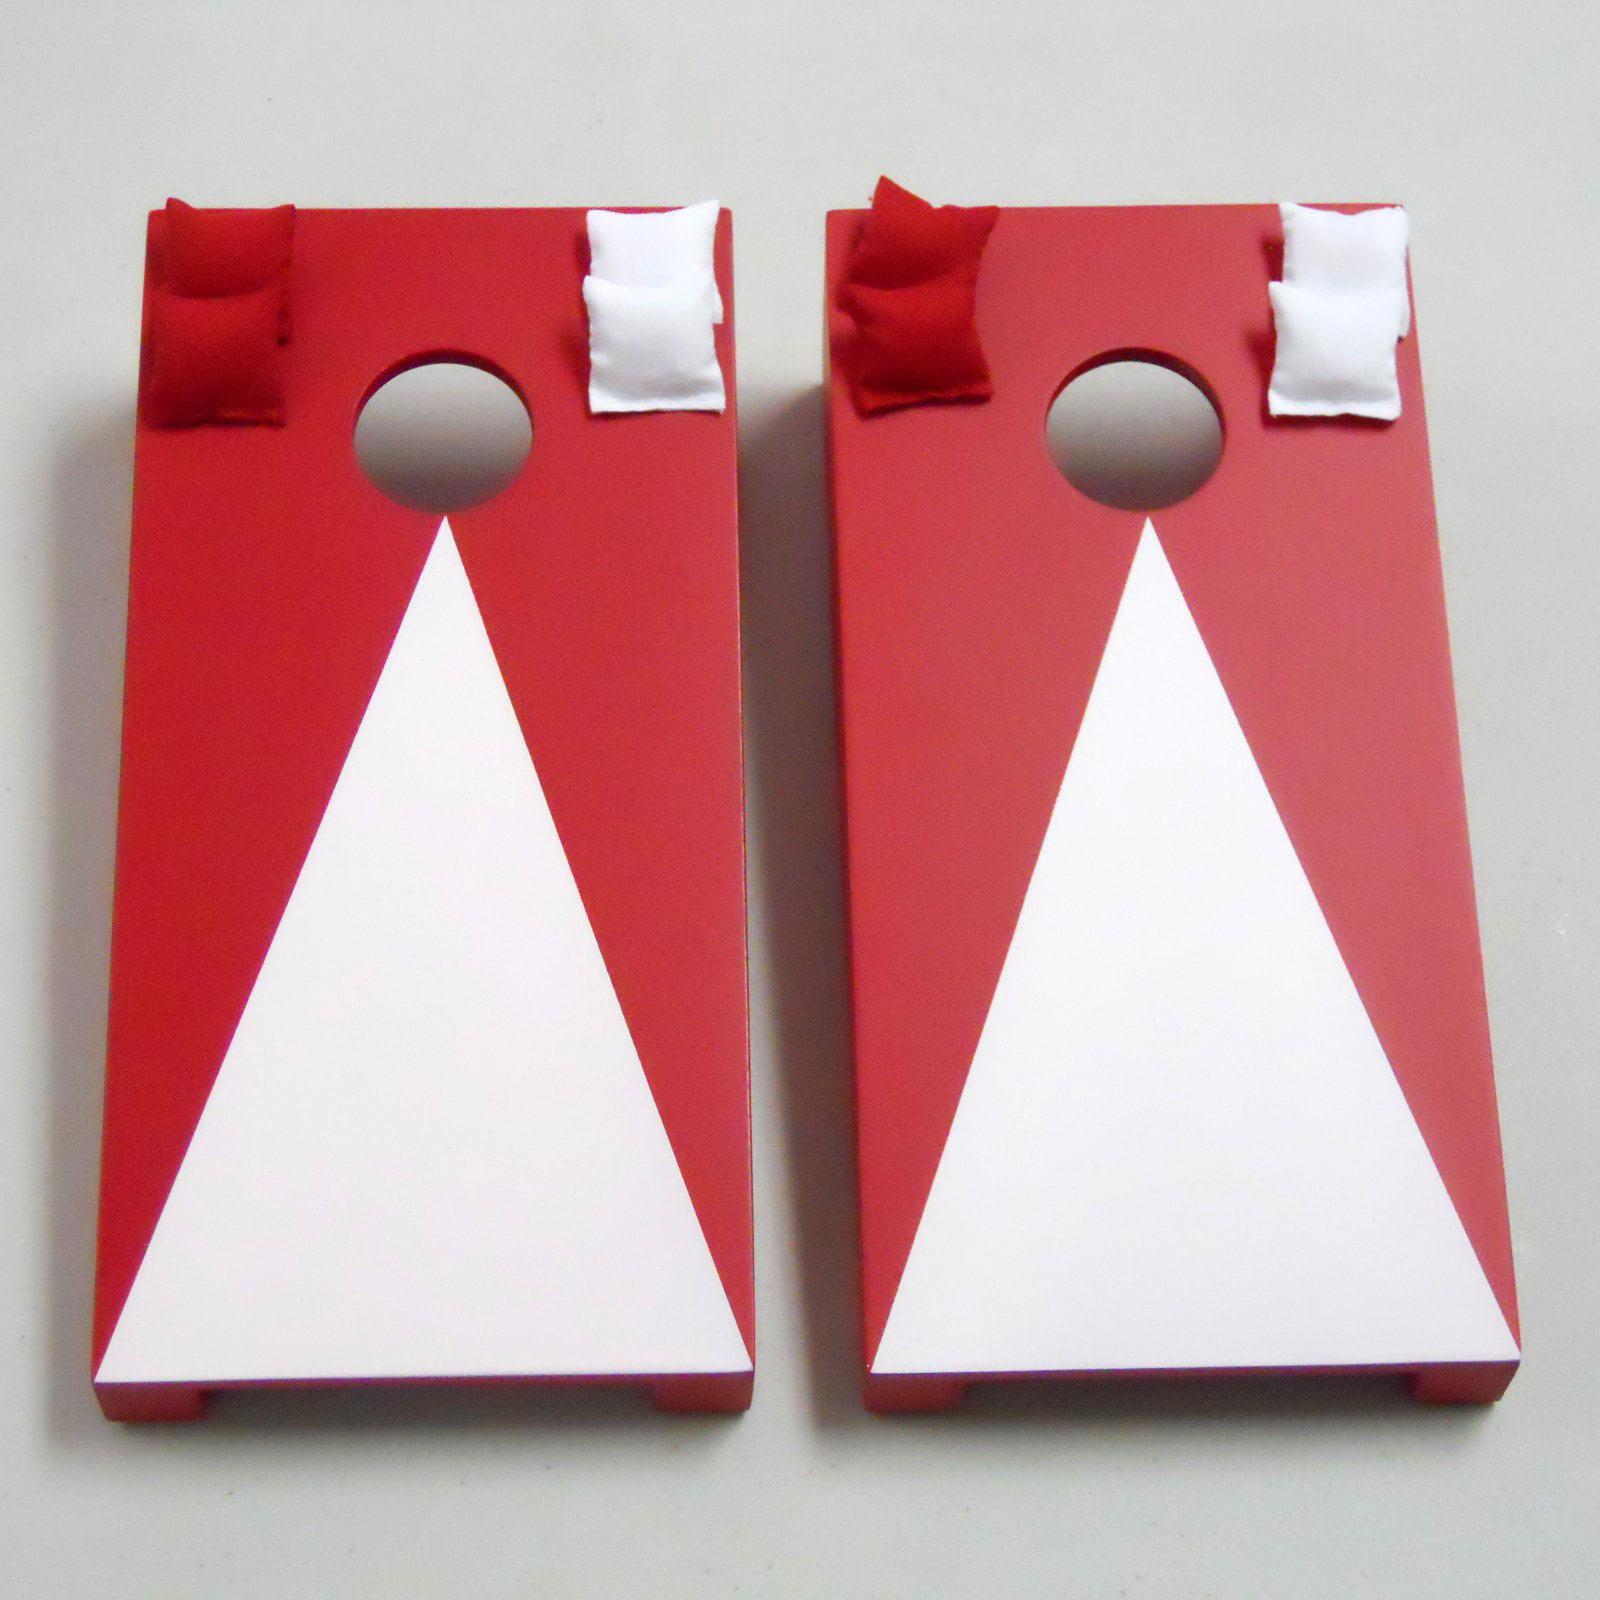 Red Pyramid Tabletop Cornhole Set